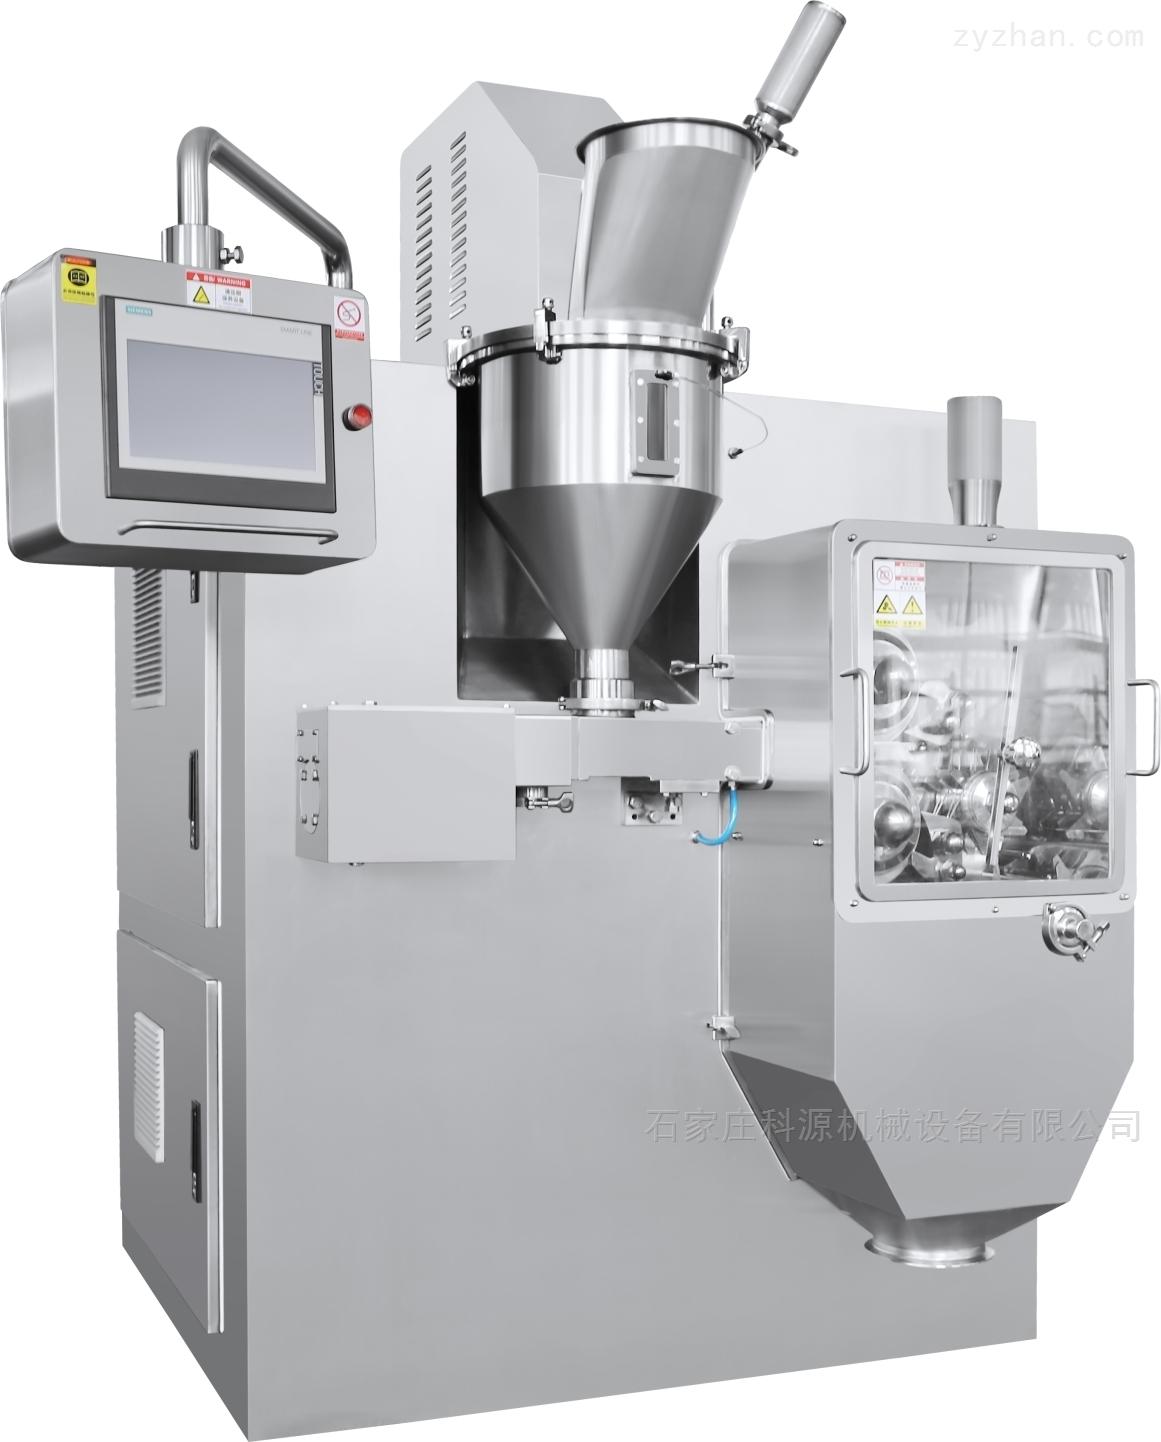 GZL200-75L型干法制粒机